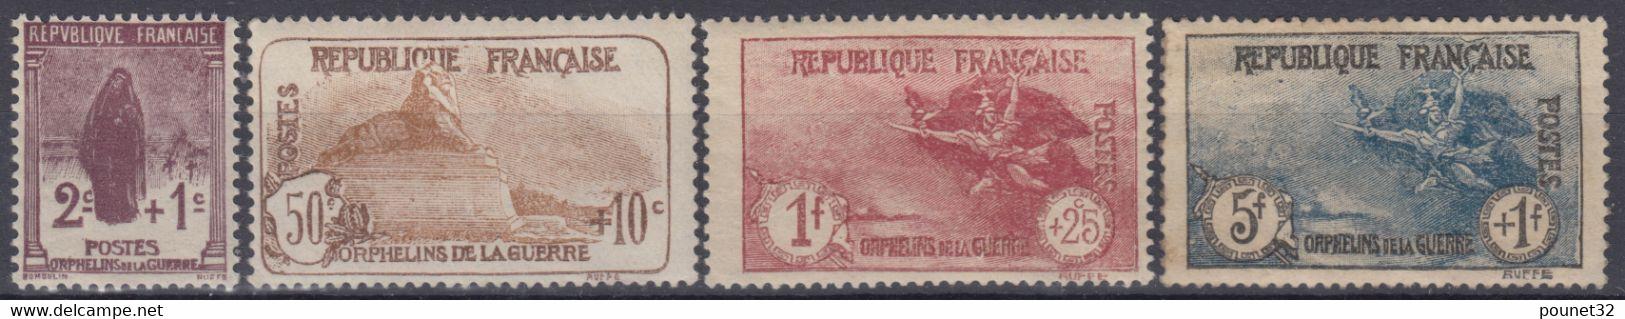 FRANCE : SERIE ORPHELIN N° 229/232 NEUVE * GOMME AVEC CHARNIERE - COTE 210 € - Ungebraucht